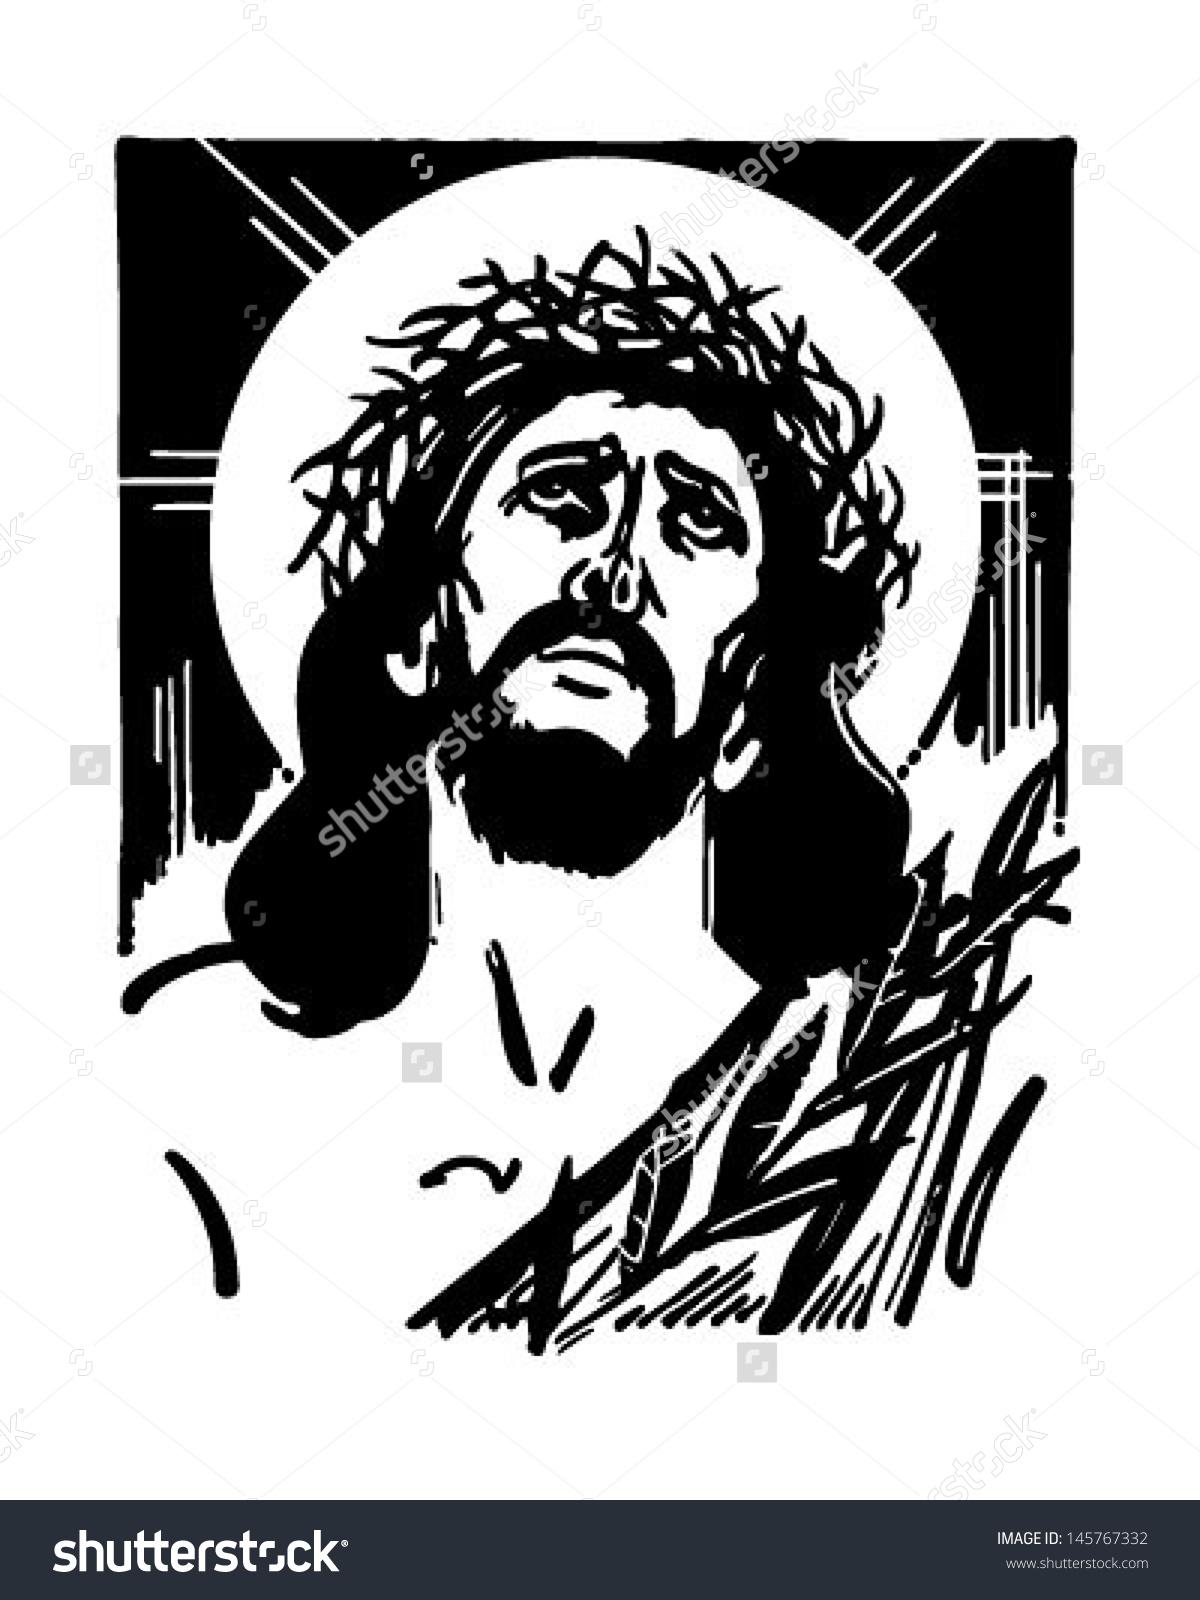 Jesus Crown Thorns Retro Clip Art Stock Vector 145767332.